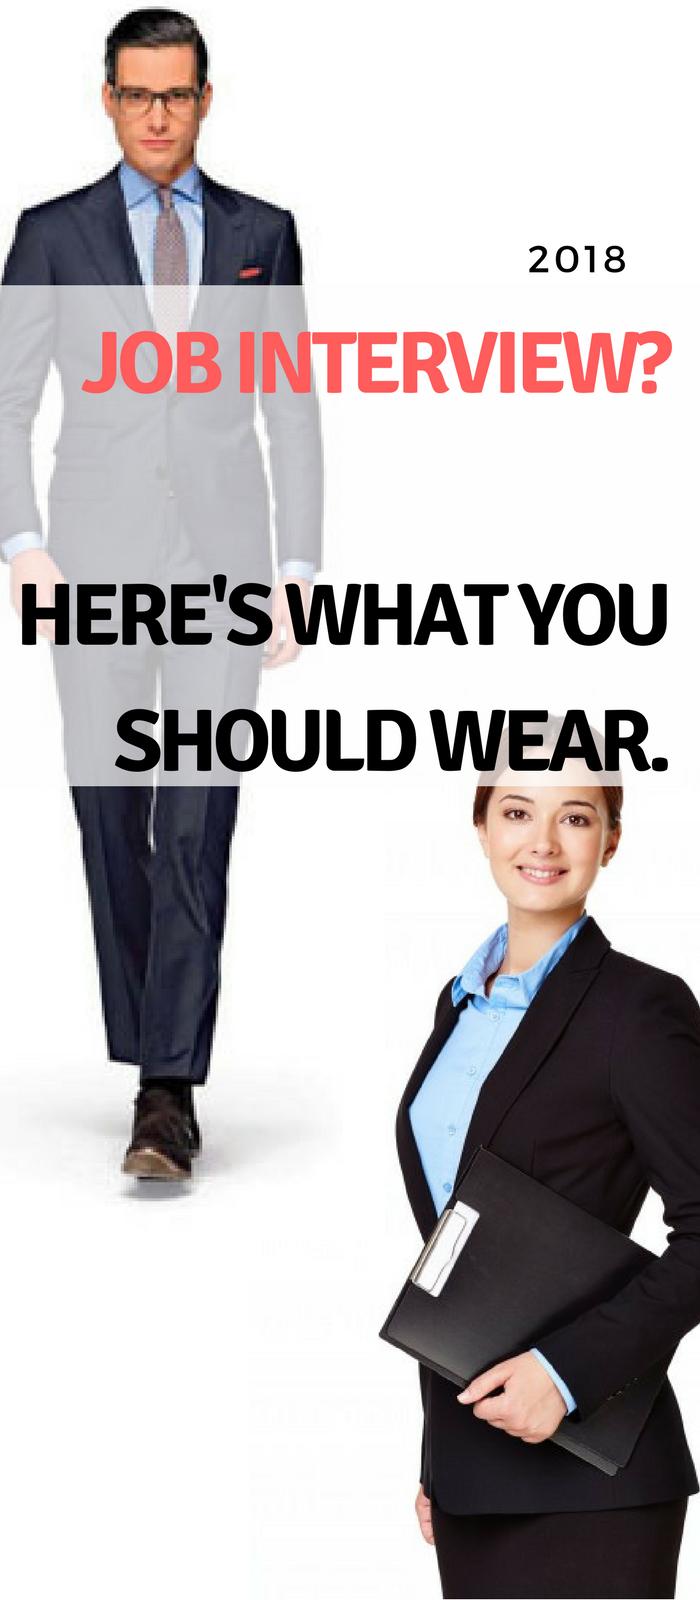 c7ffe77da01d Job interview  Here s what you should wear! www.tuckedtrunks.com